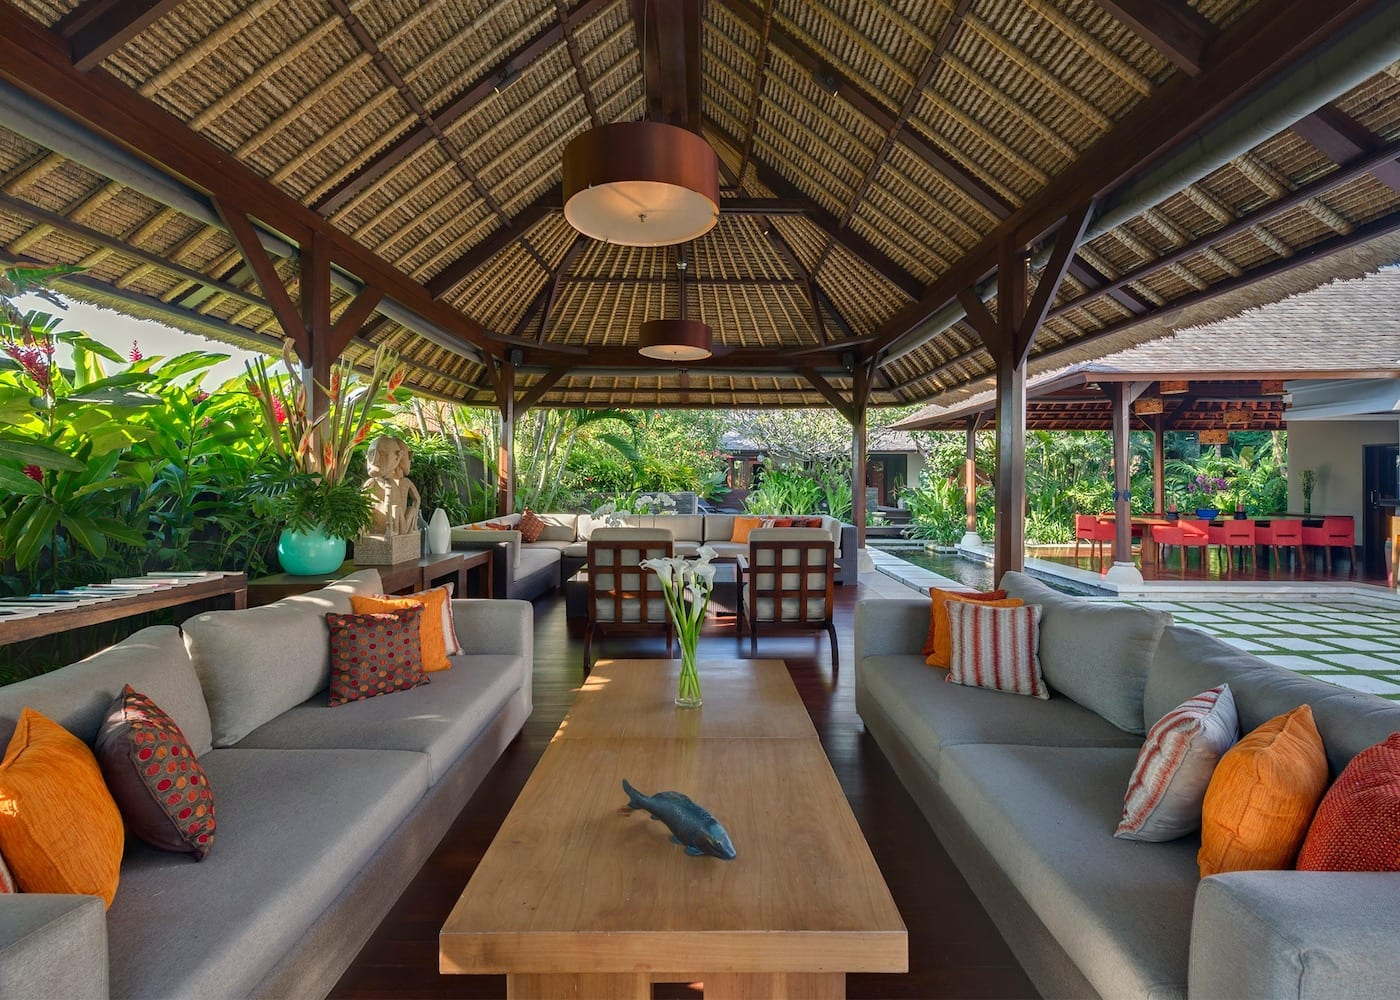 Inside Villa Asta - one of the best private villas in Seminyak, Bali, Indonesia